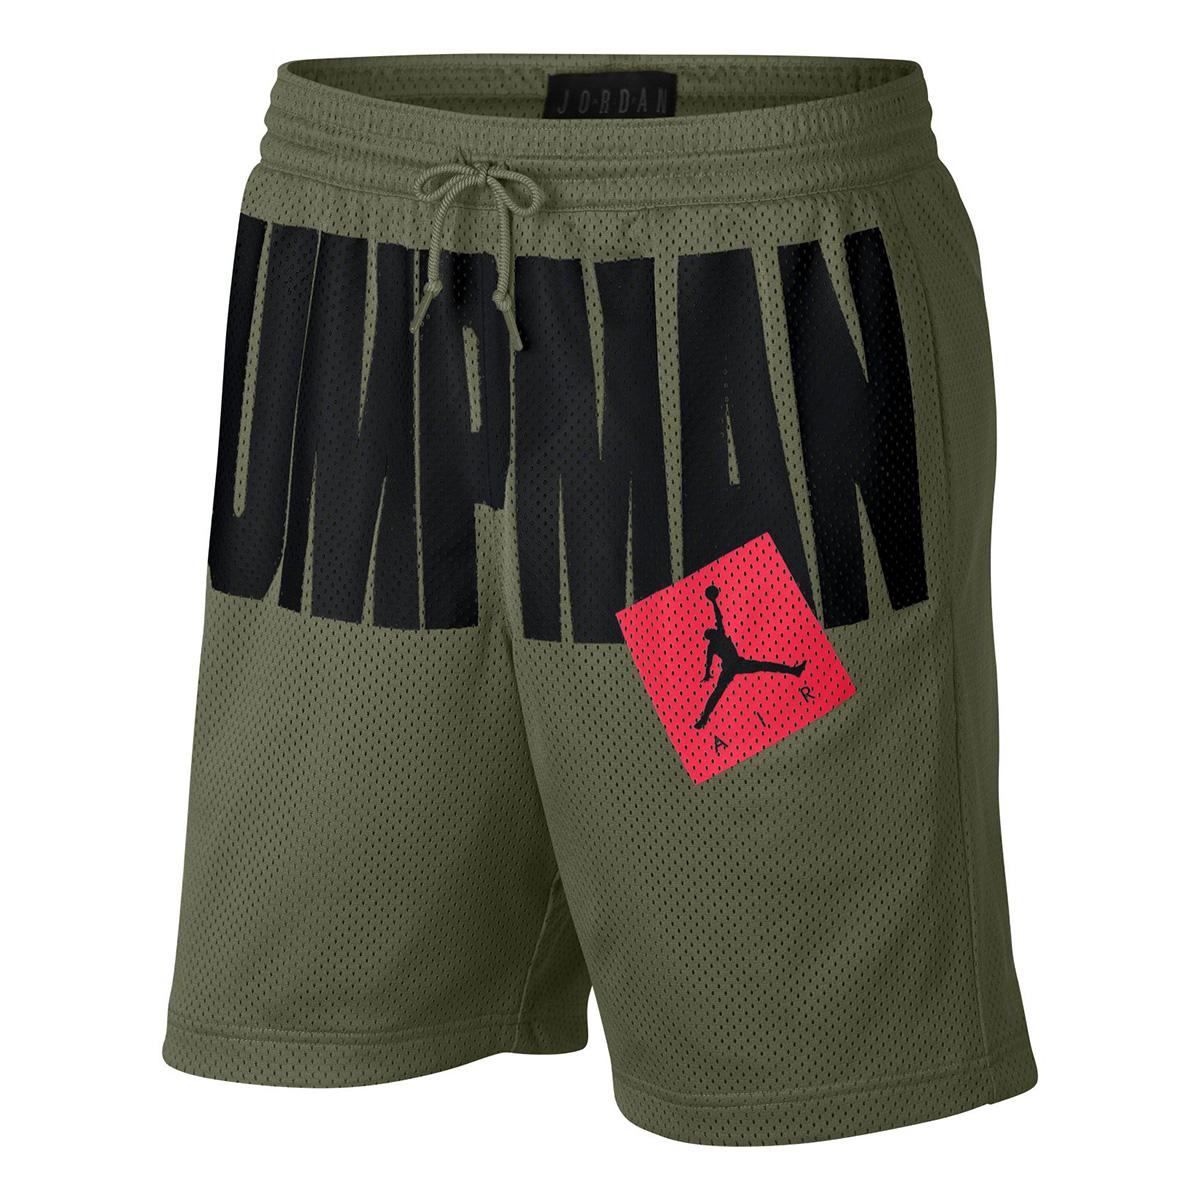 5484412b7ffabf Jordan Jumpman Air Shorts - SPORTING GOODS Basketball Shorts ...